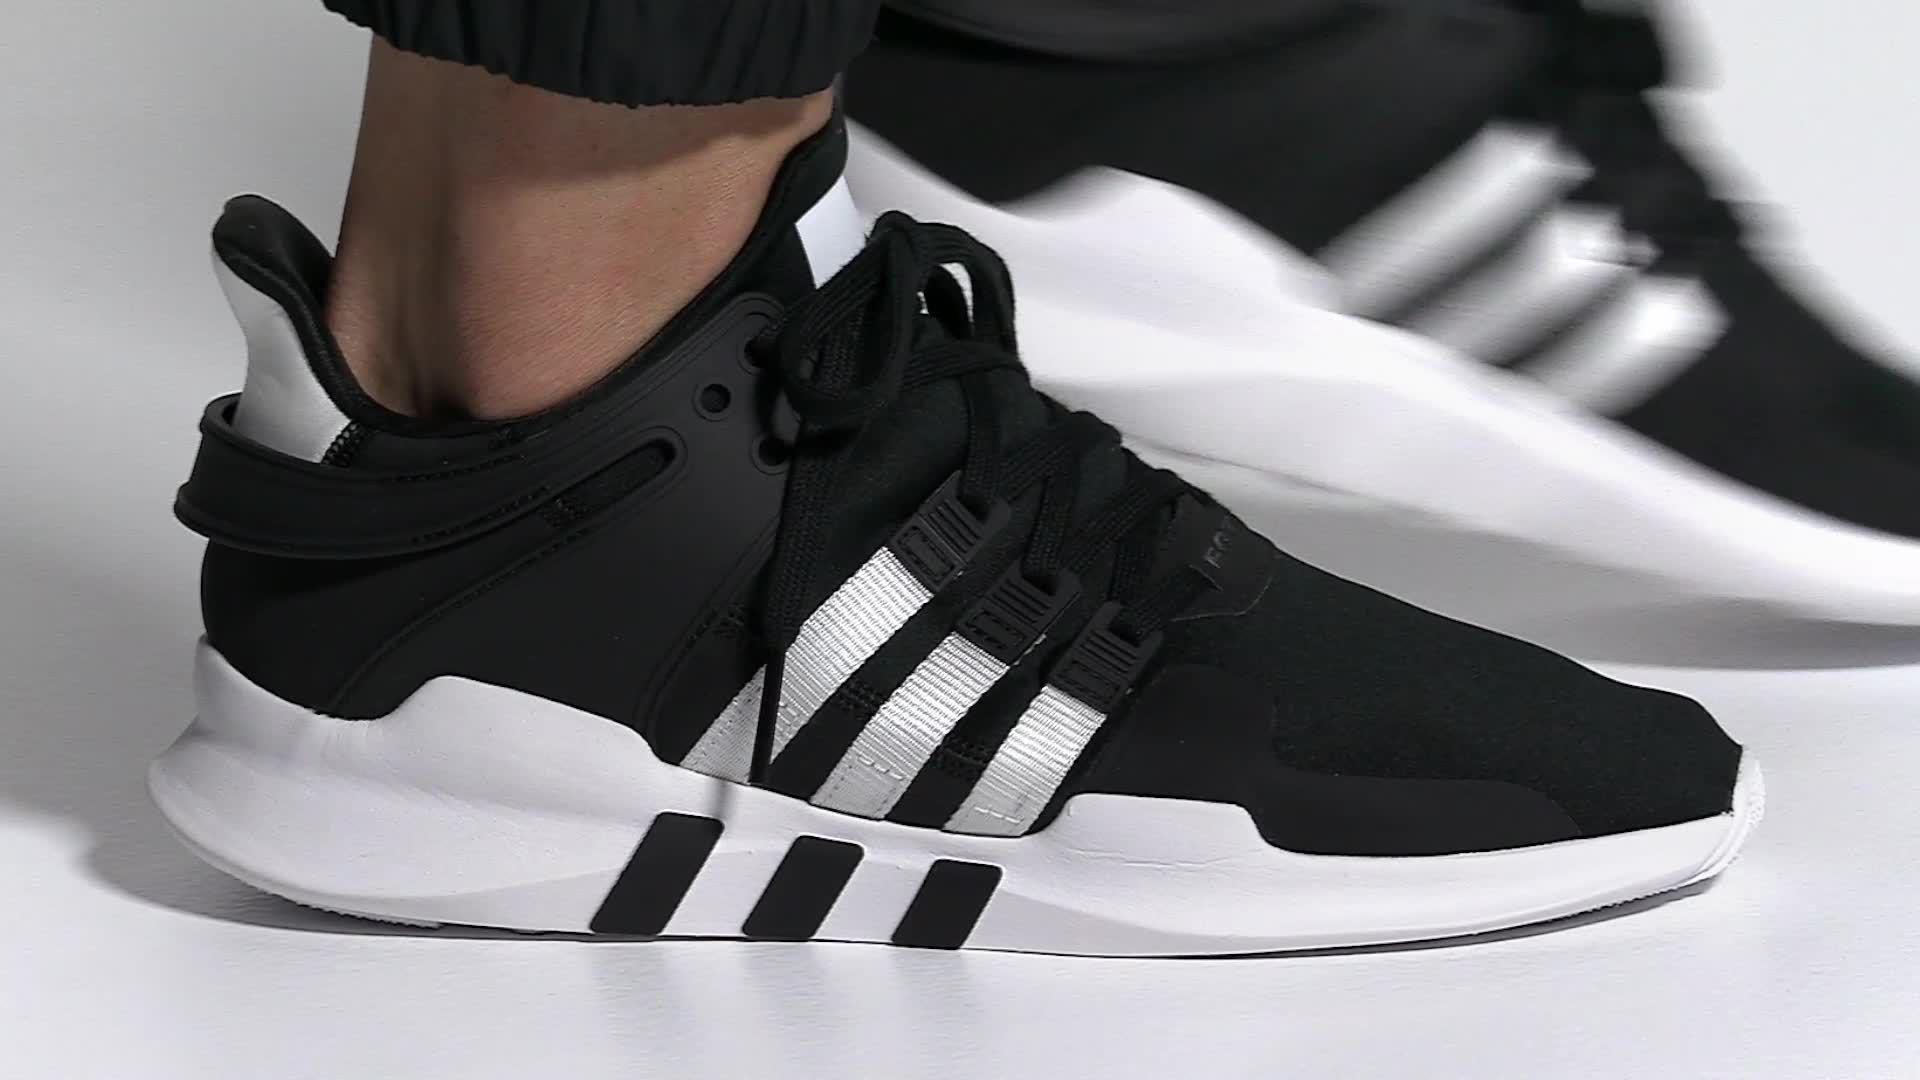 check out 363f7 b9377 Adidas - Gray Originals Eqt Support Adv Shoes for Men - Lyst. View  fullscreen